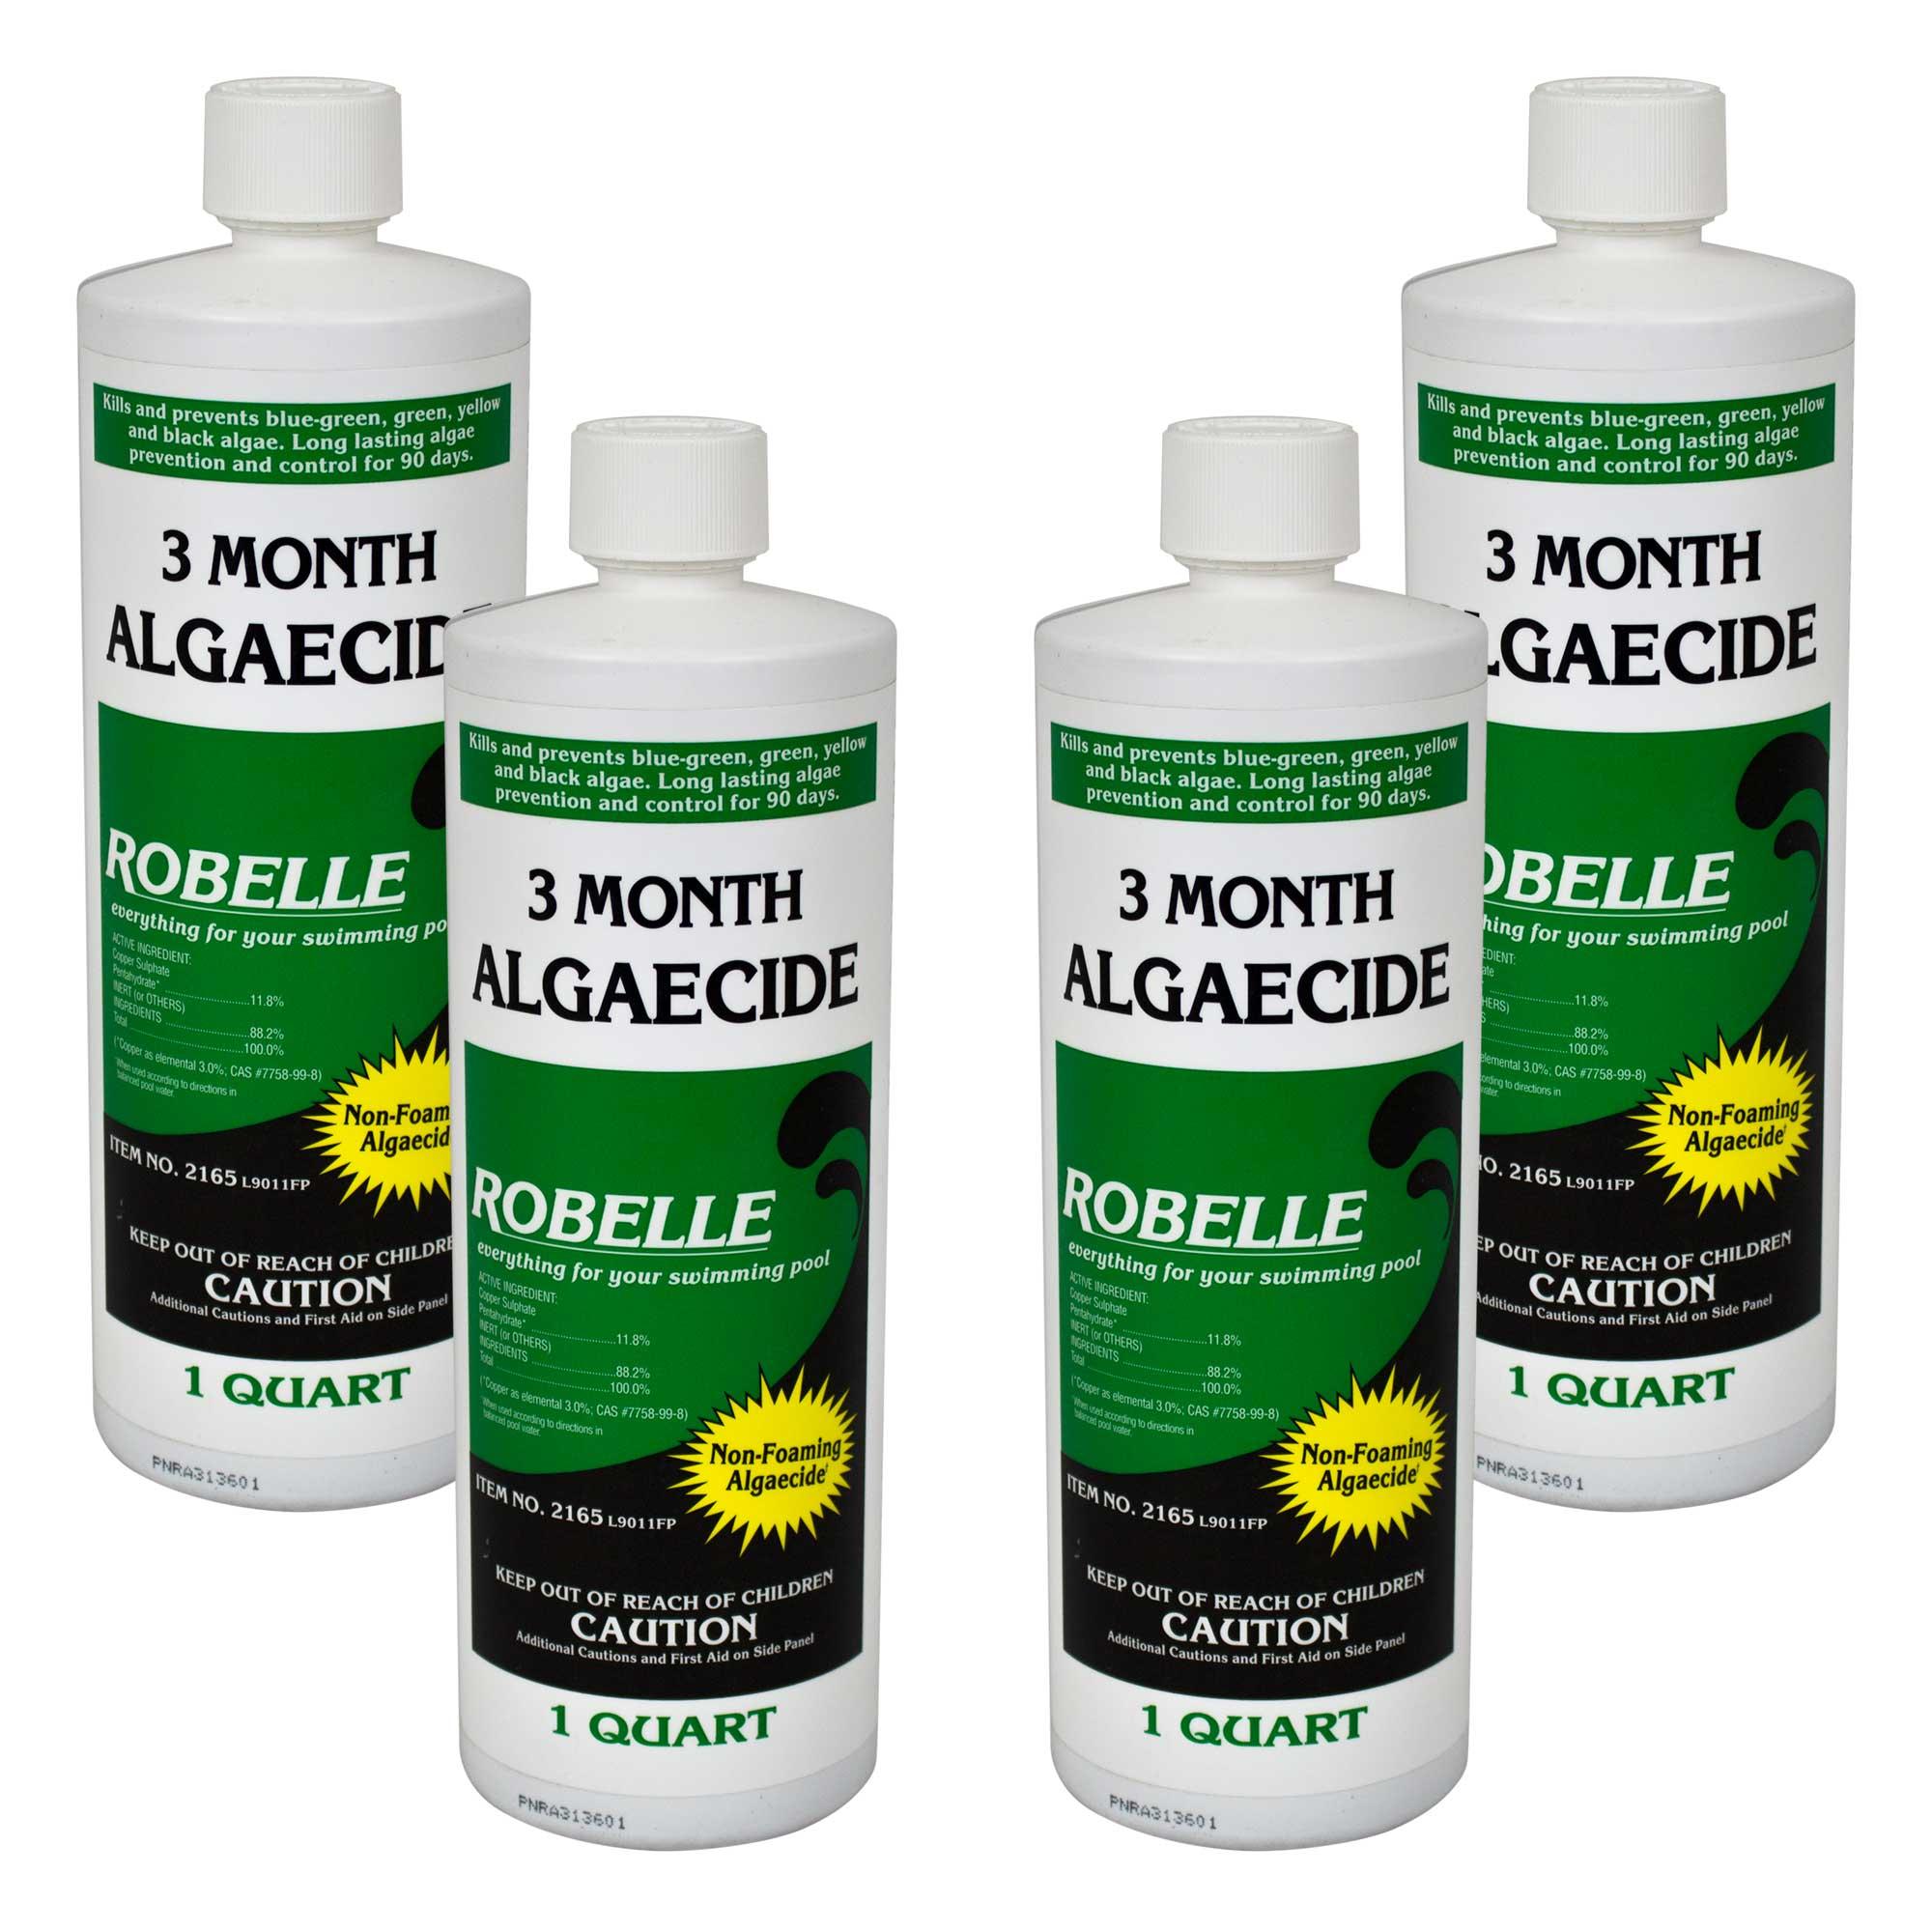 Robelle 3 Month Algaecide